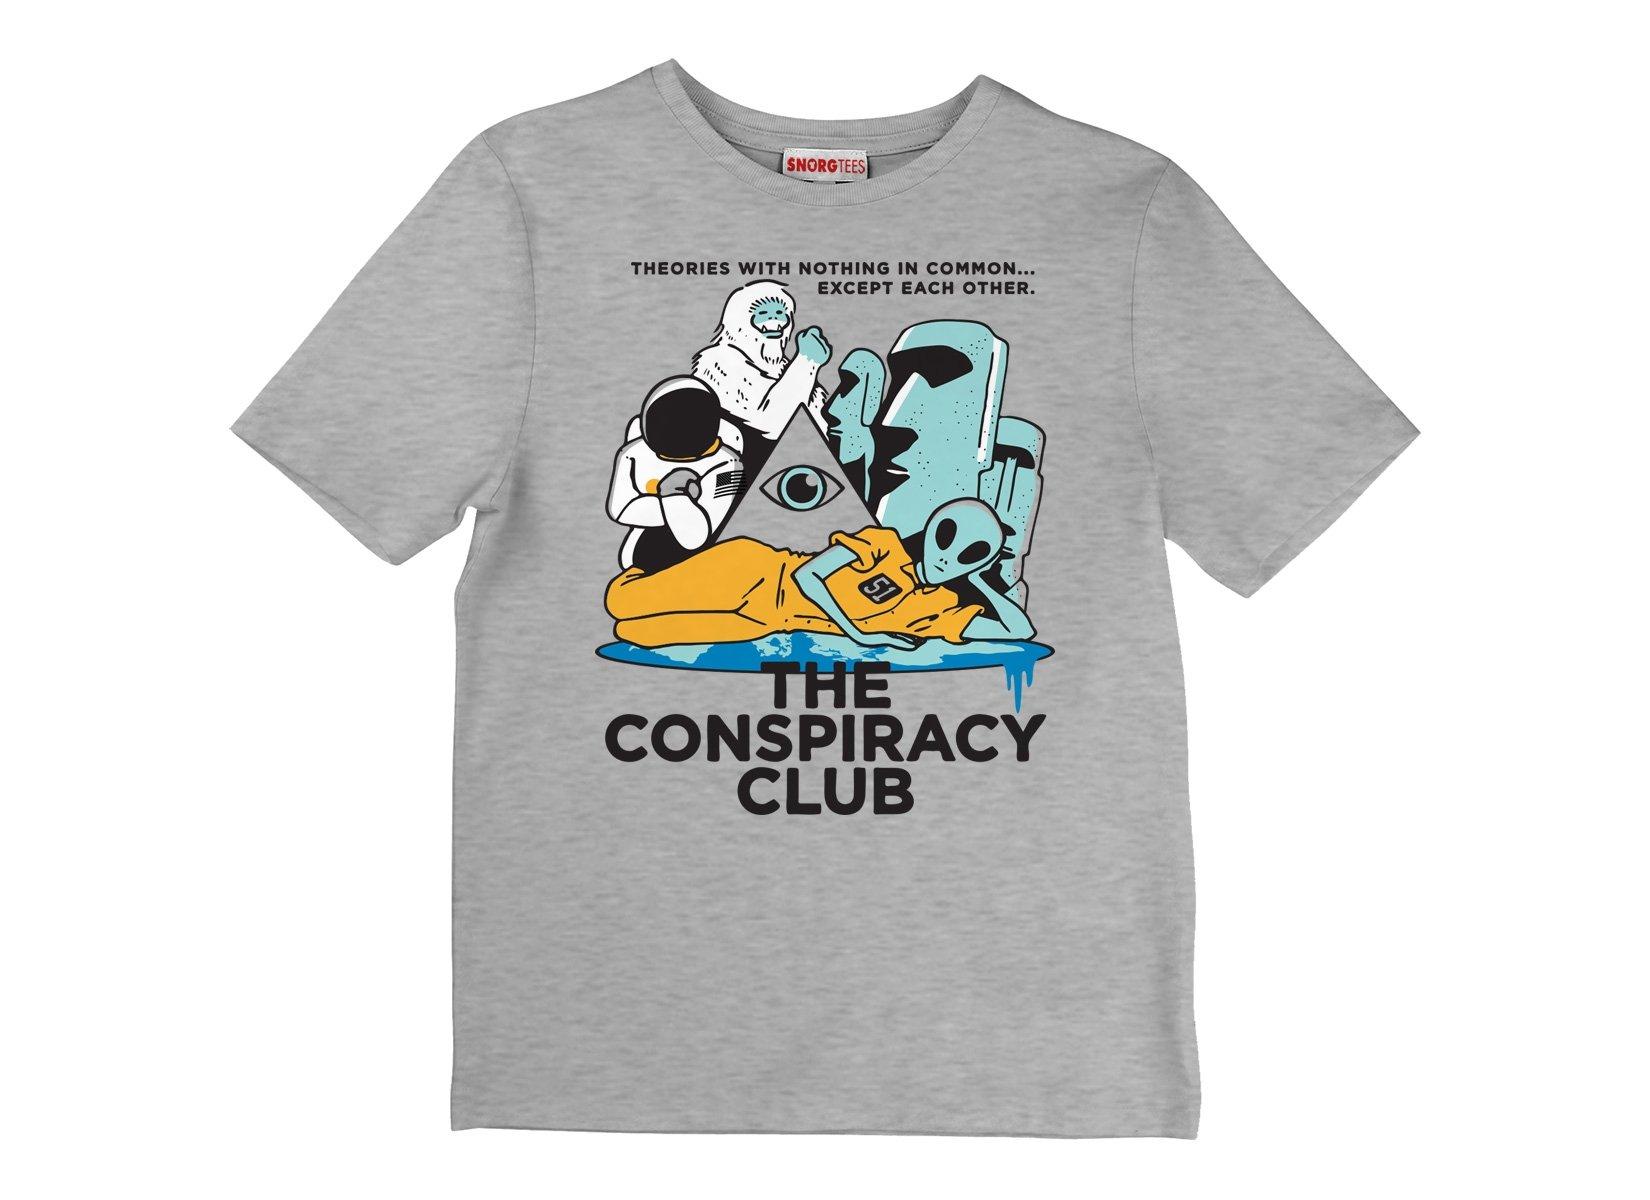 The Conspiracy Club on Kids T-Shirt